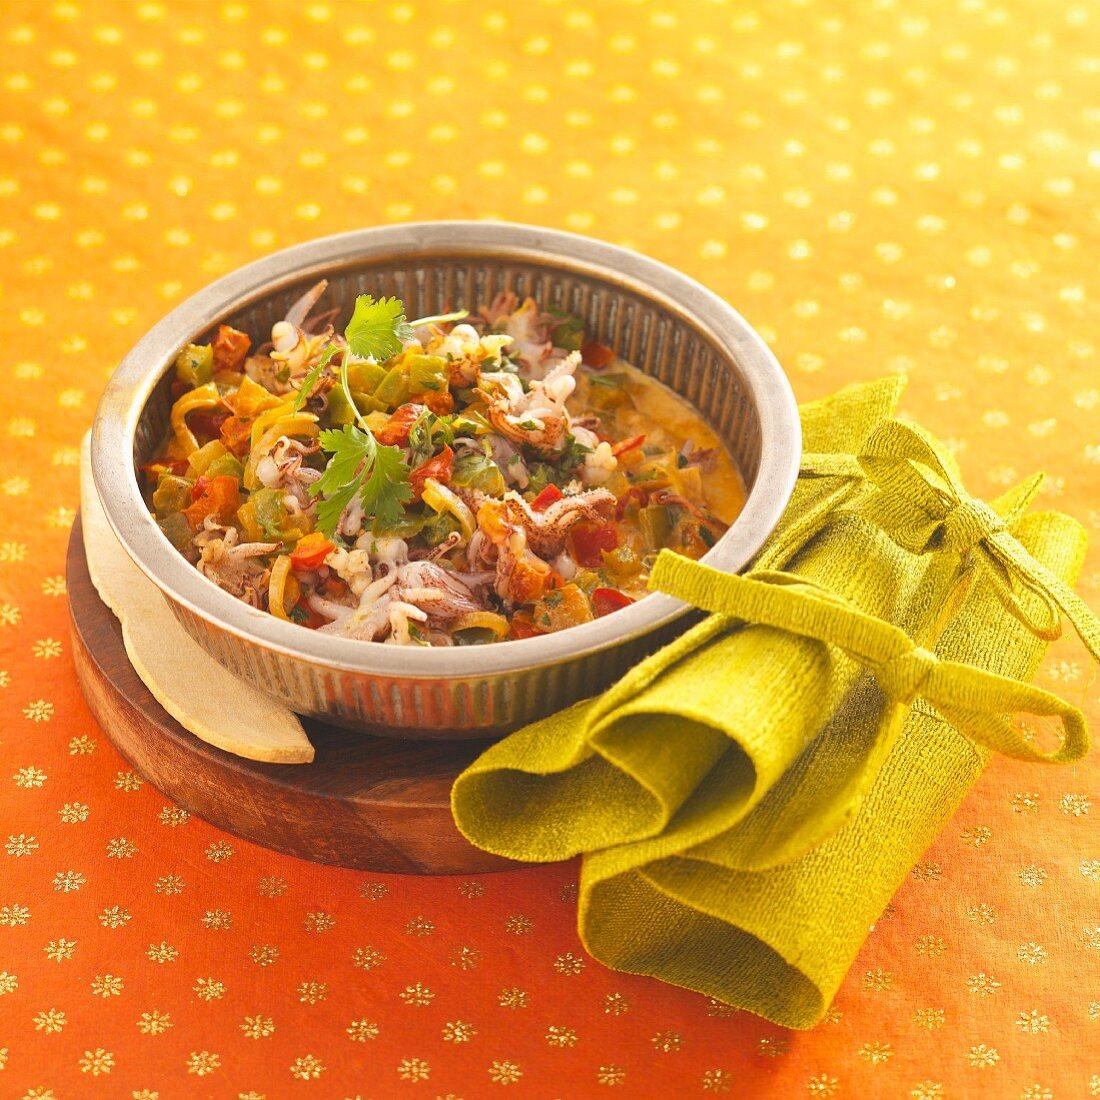 Quick stir-fried seafood dish